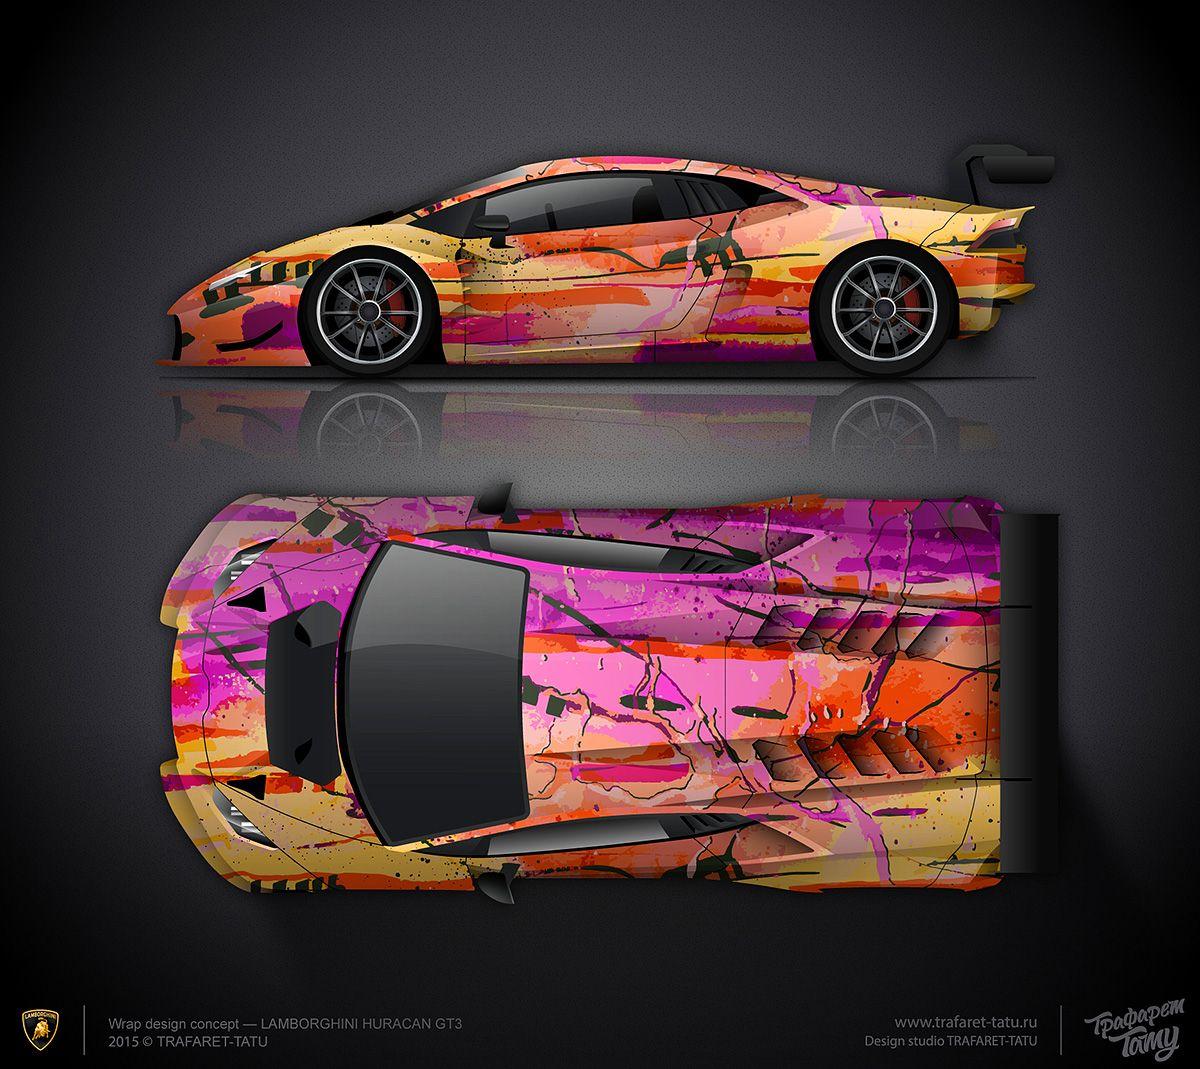 Wrap Design Concept #1 Artcar LAMBORGHINI HURACAN GT3